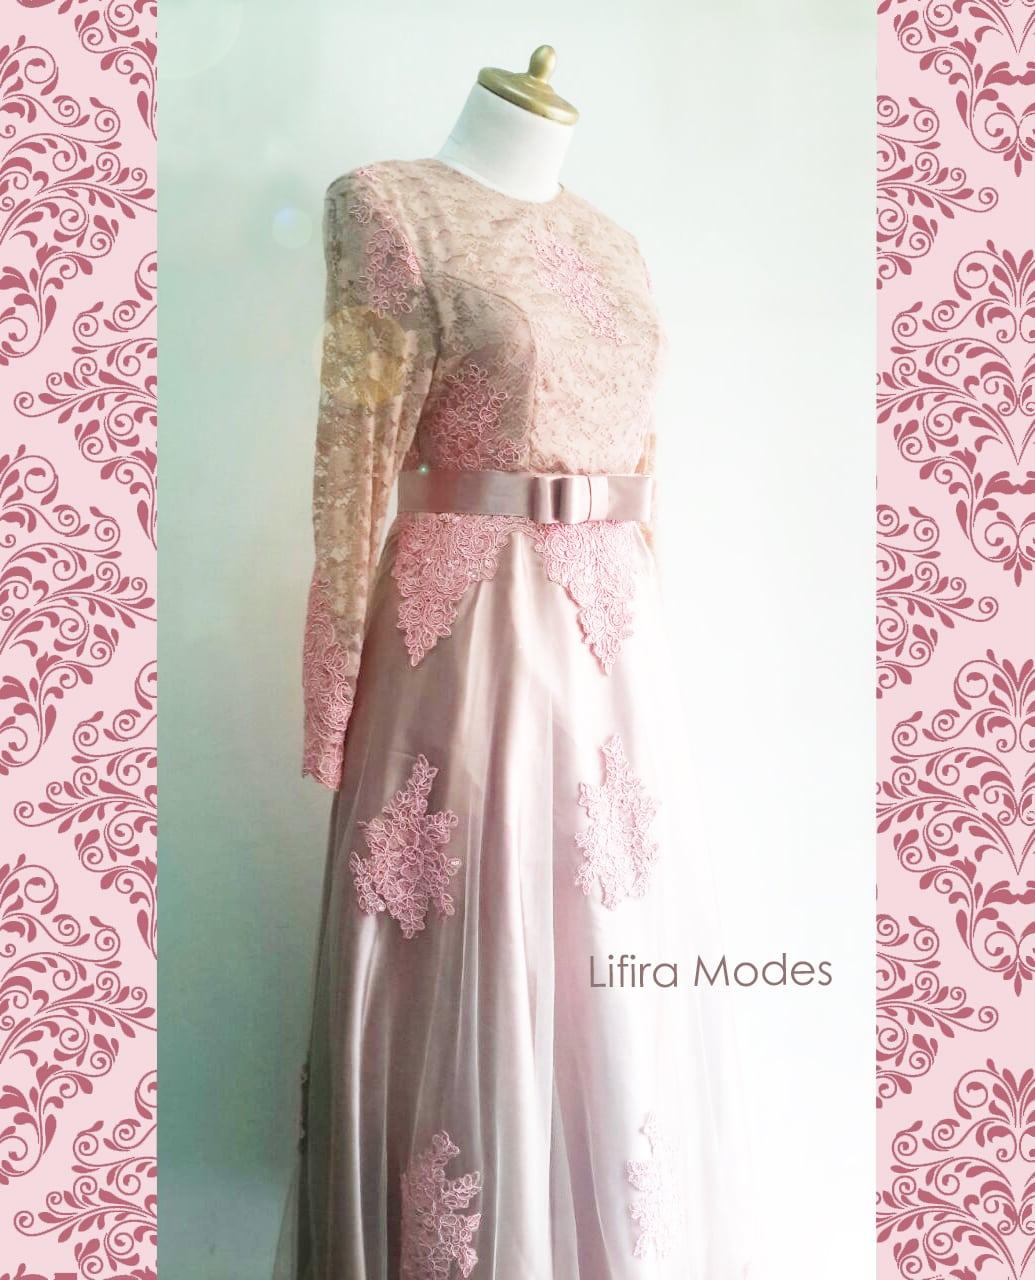 PINK PRINCESSY DRESS1